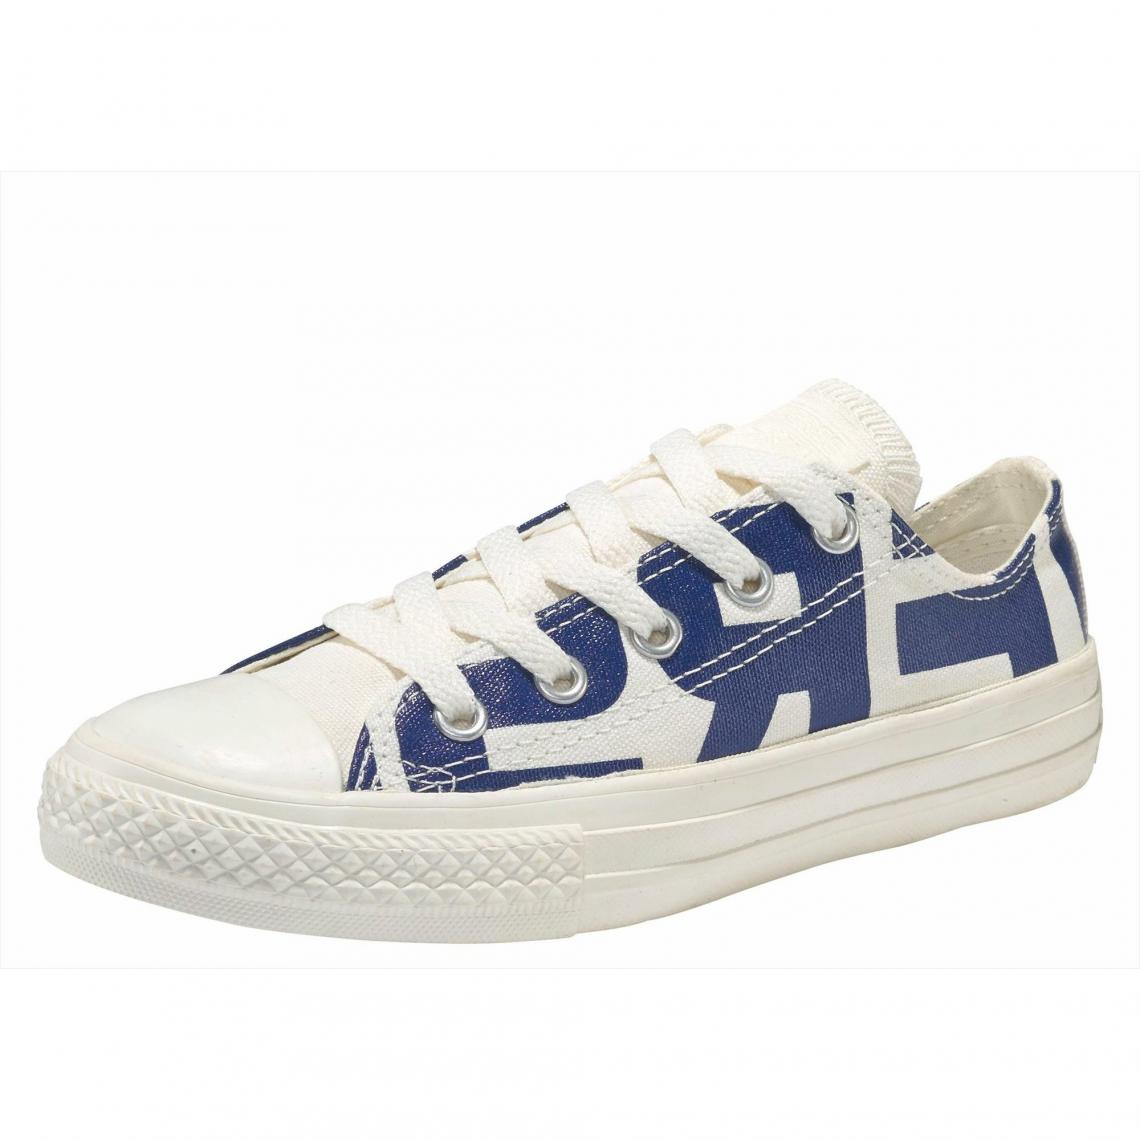 9dc2e1b781973 Sneakers basses imprimées junior Converse Chuck Taylor All Star Ox Youth -  Blanc - Bleu Converse